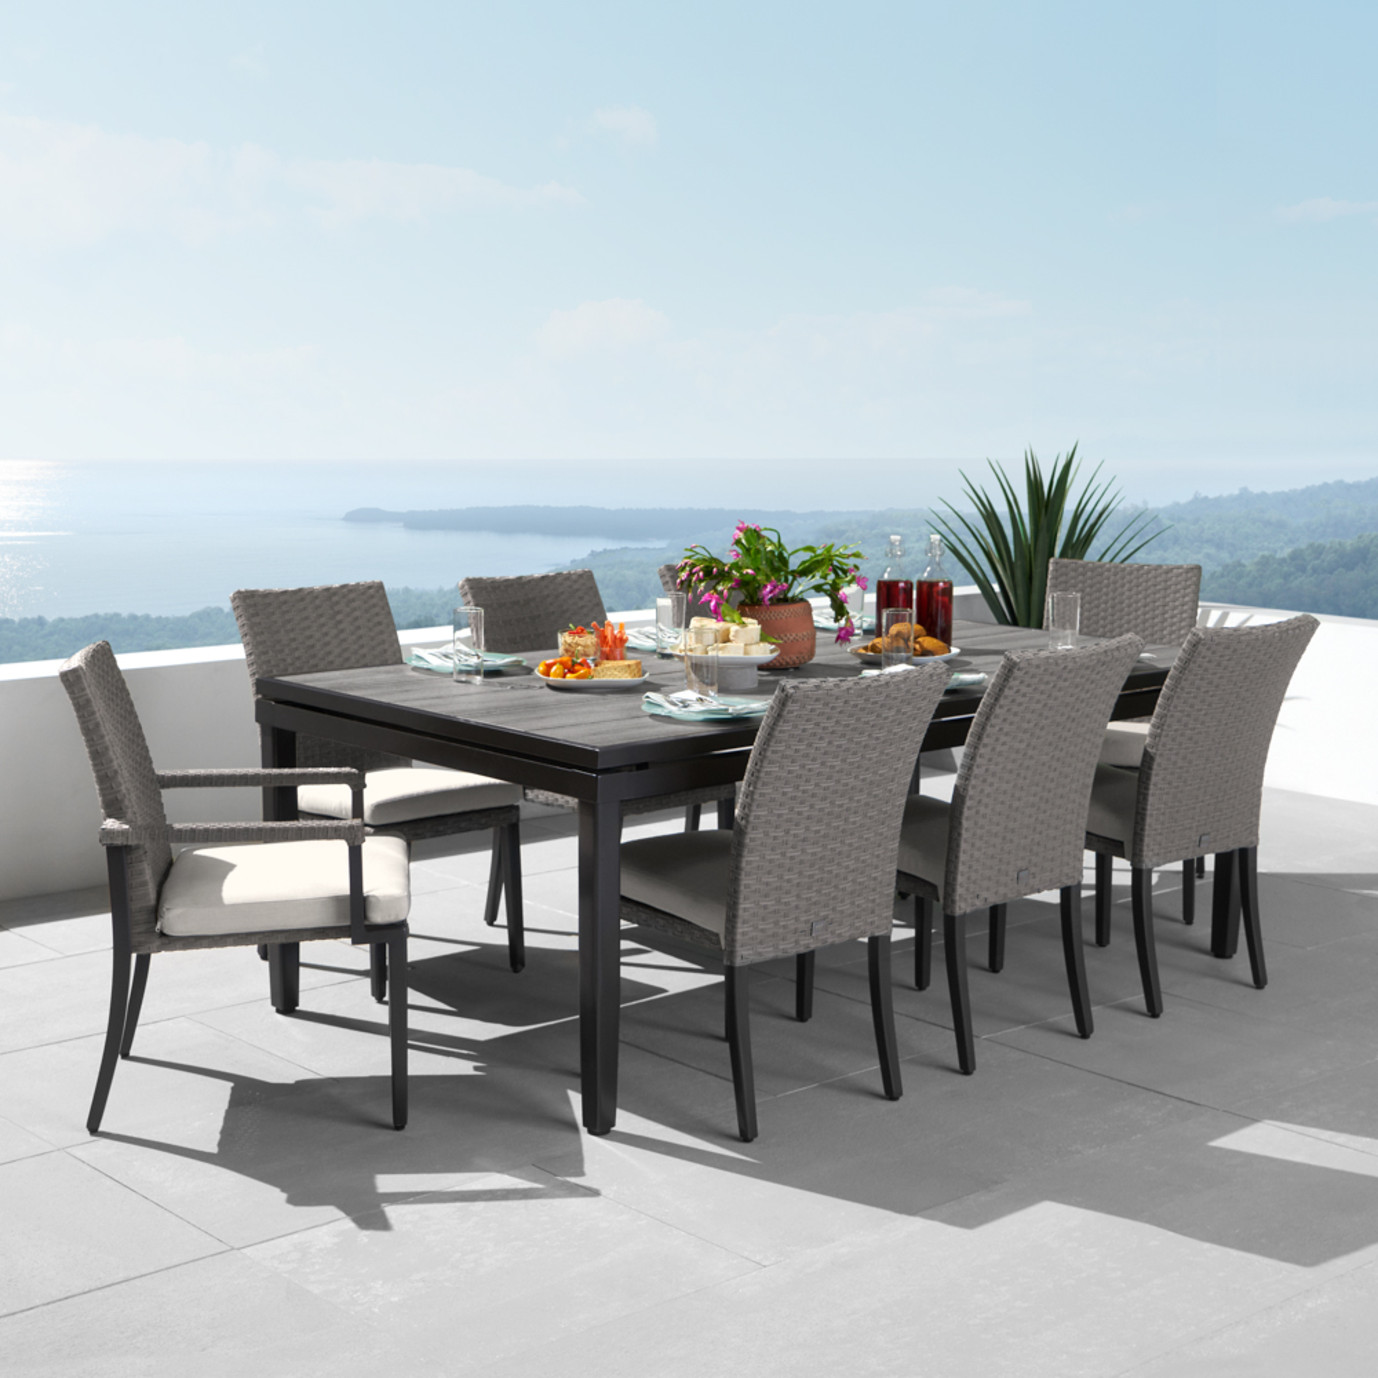 Vistano™ 9pc Outdoor Dining Set